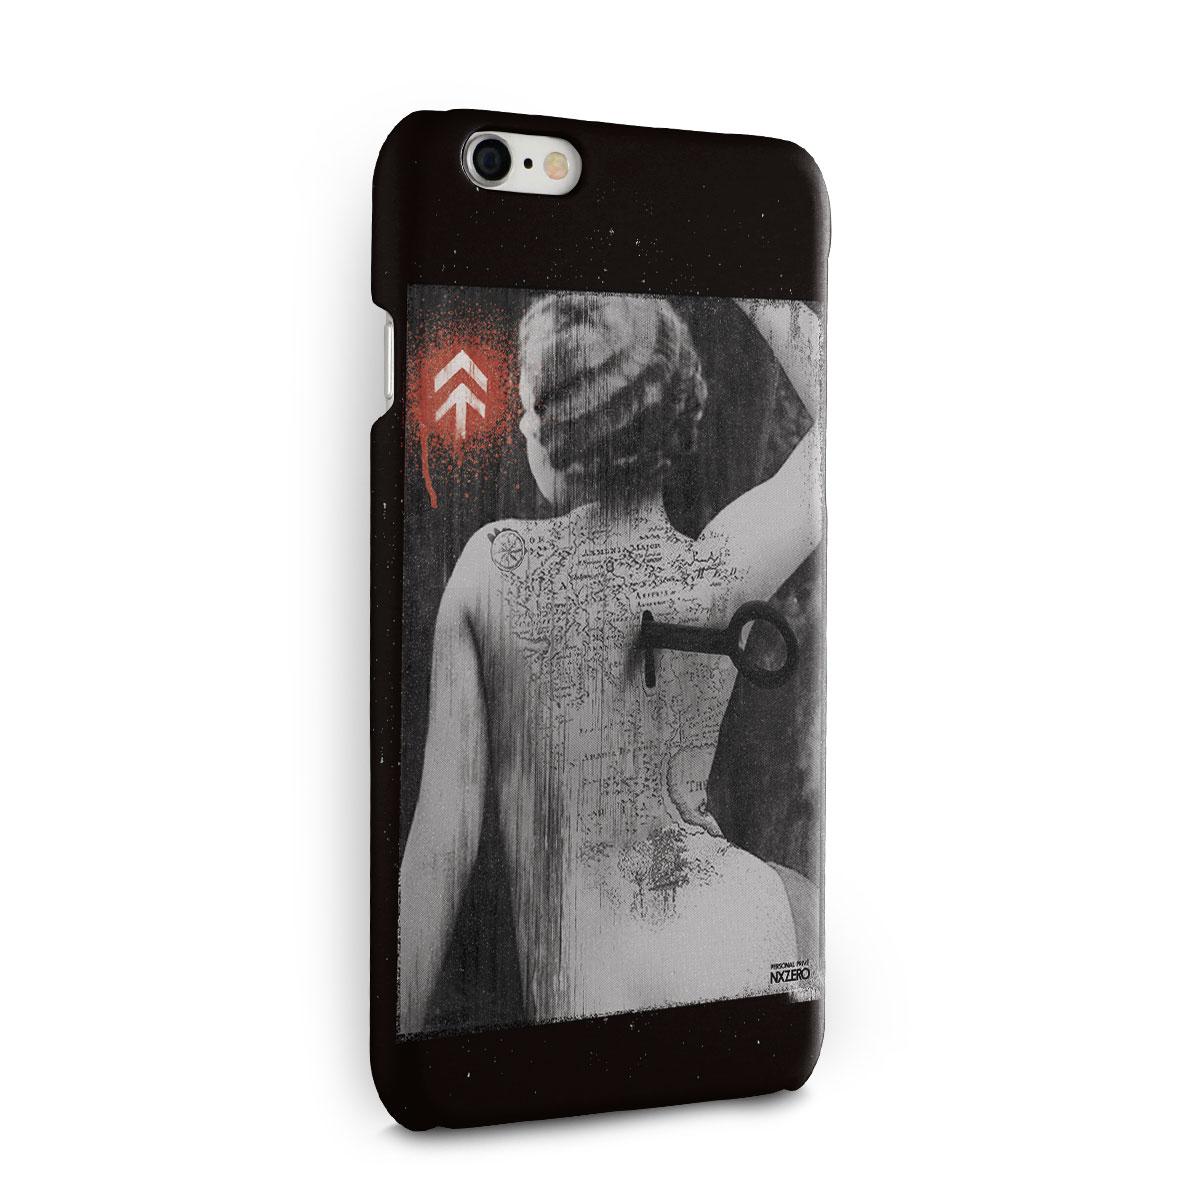 Capa para iPhone 6/6S NXZero Personal Prive